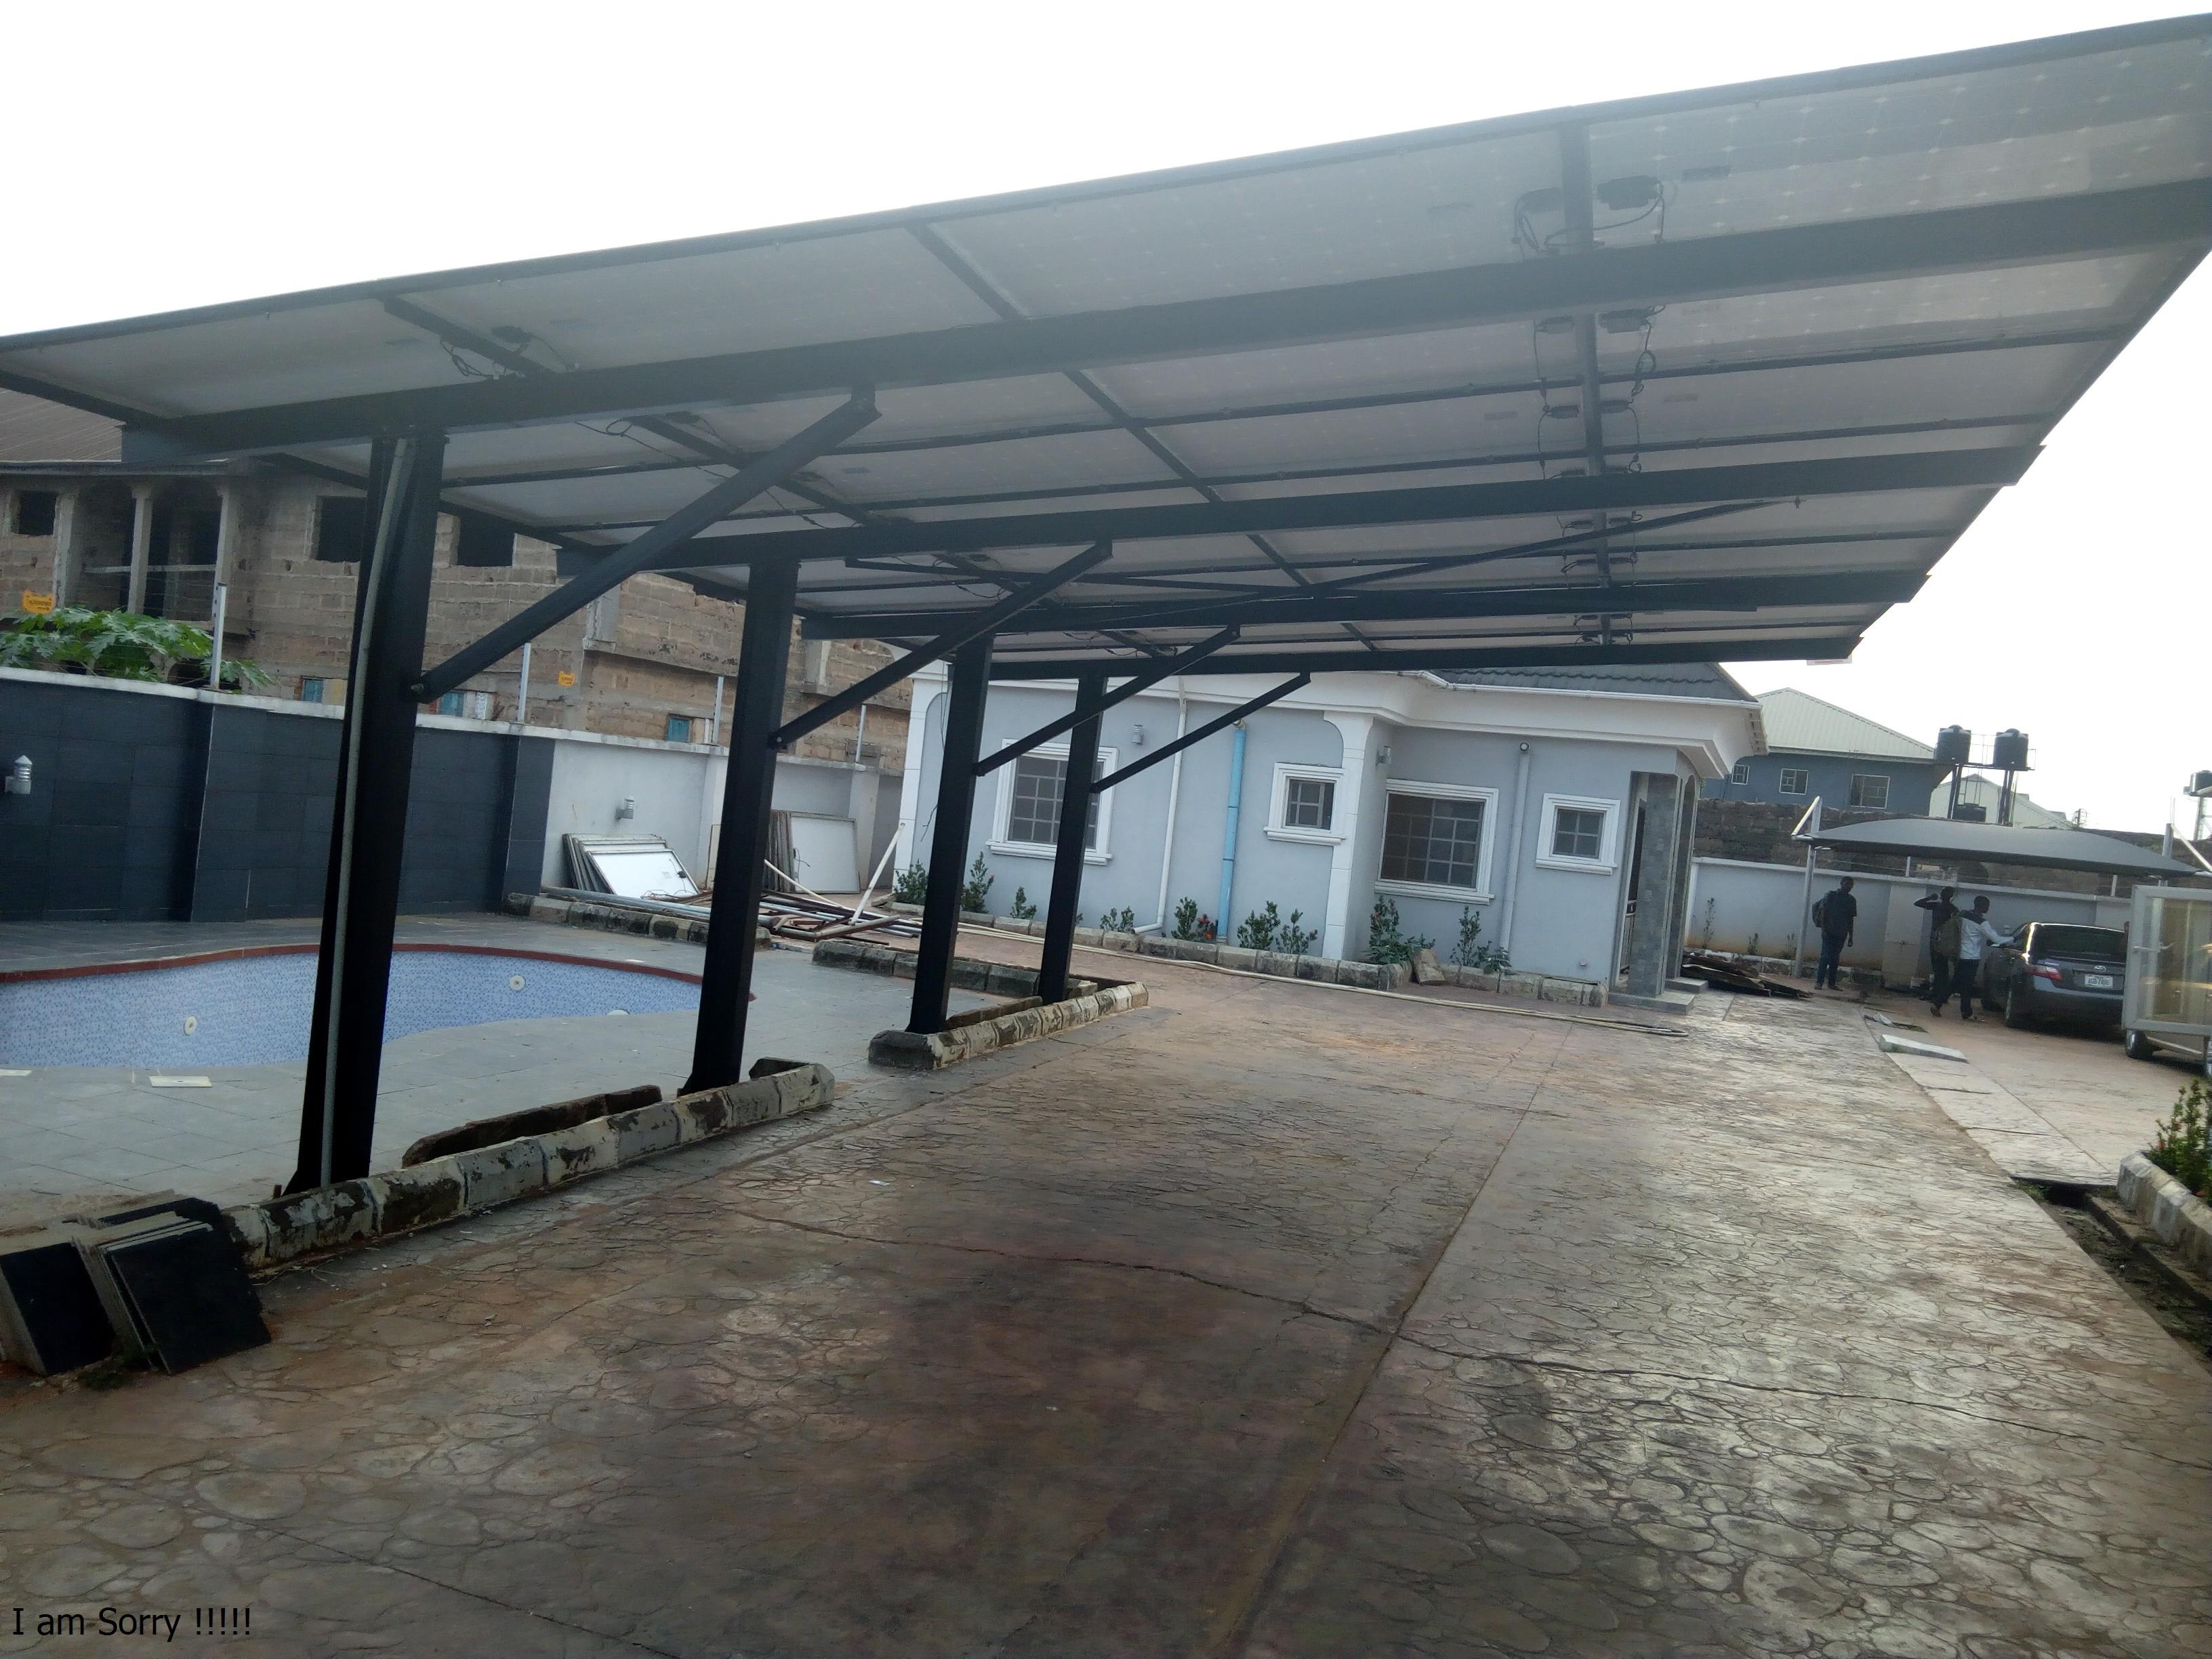 Solar Panel Sheds & Car Ports